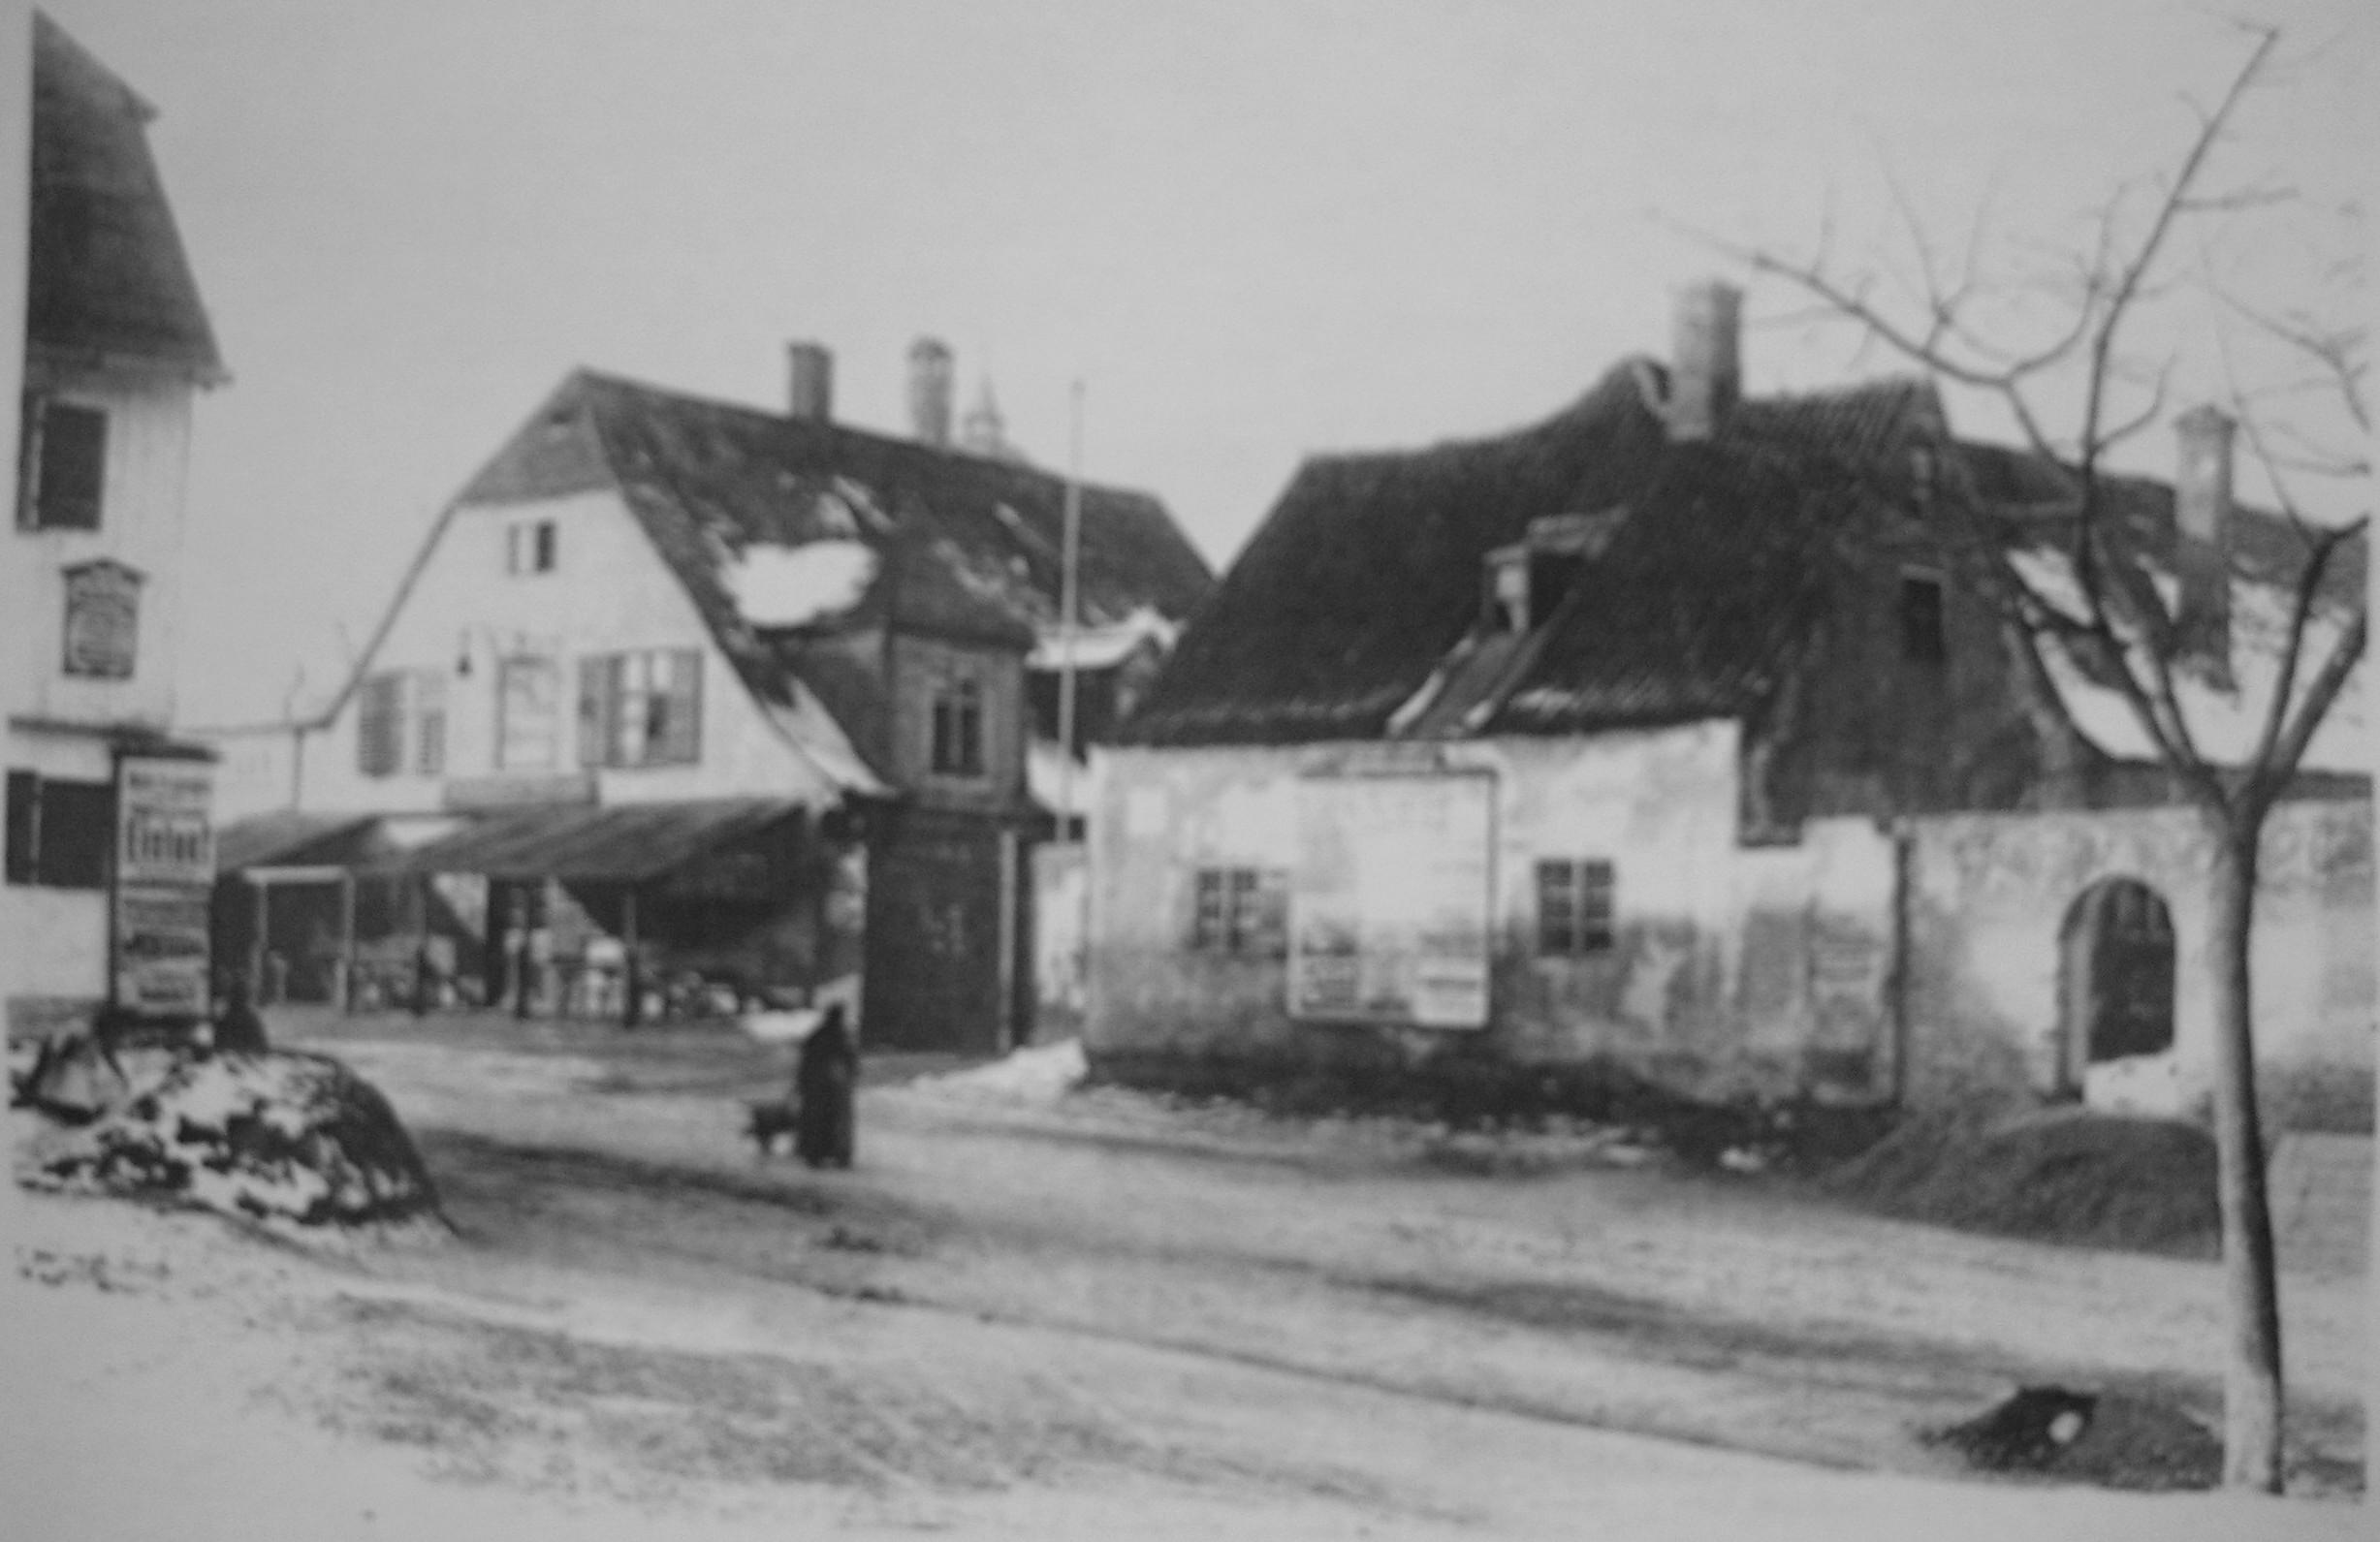 Nockherberg